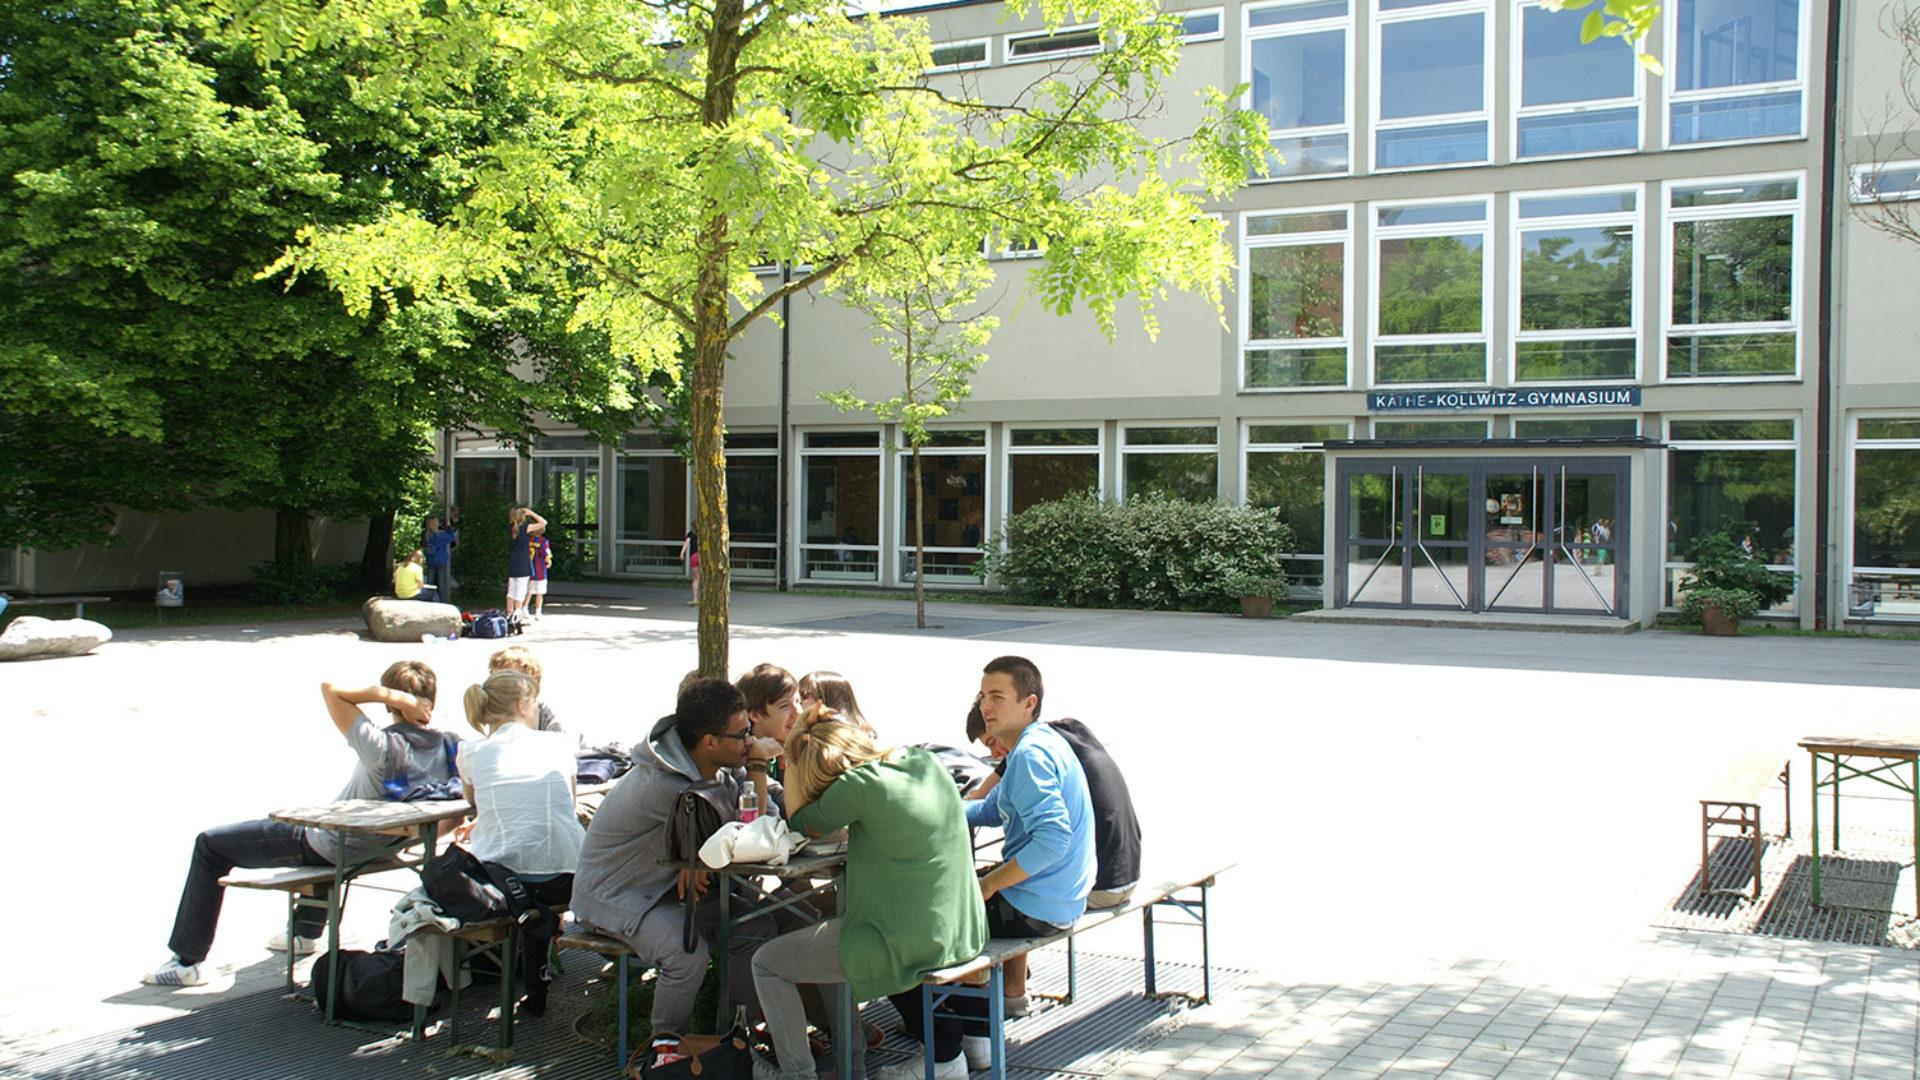 Freundeskreis des Käthe-Kollwitz-Gymnasiums e.V.